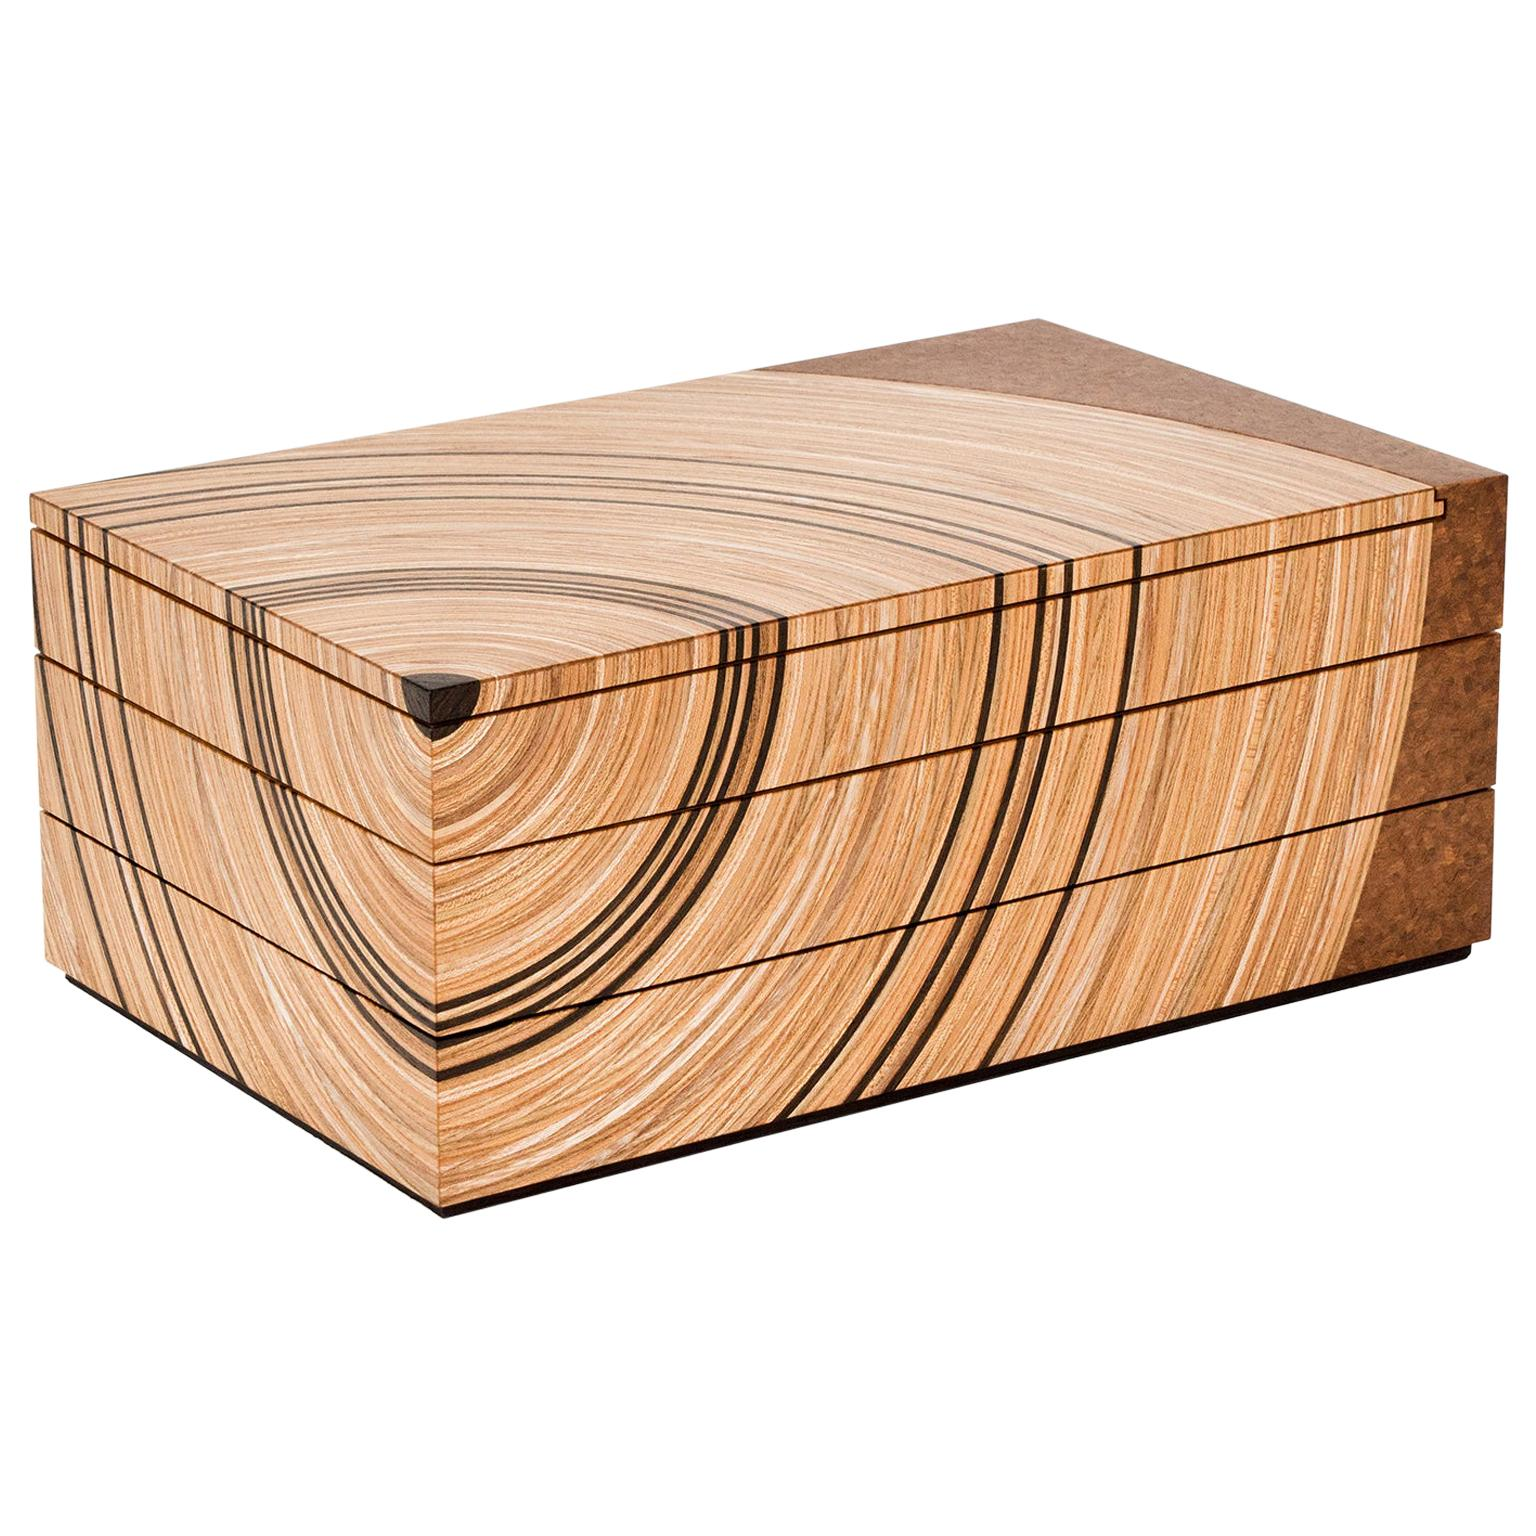 Contemporary Keepsake Box in Elm and Fumed Oak 'Family Tree' by Edward Johnson